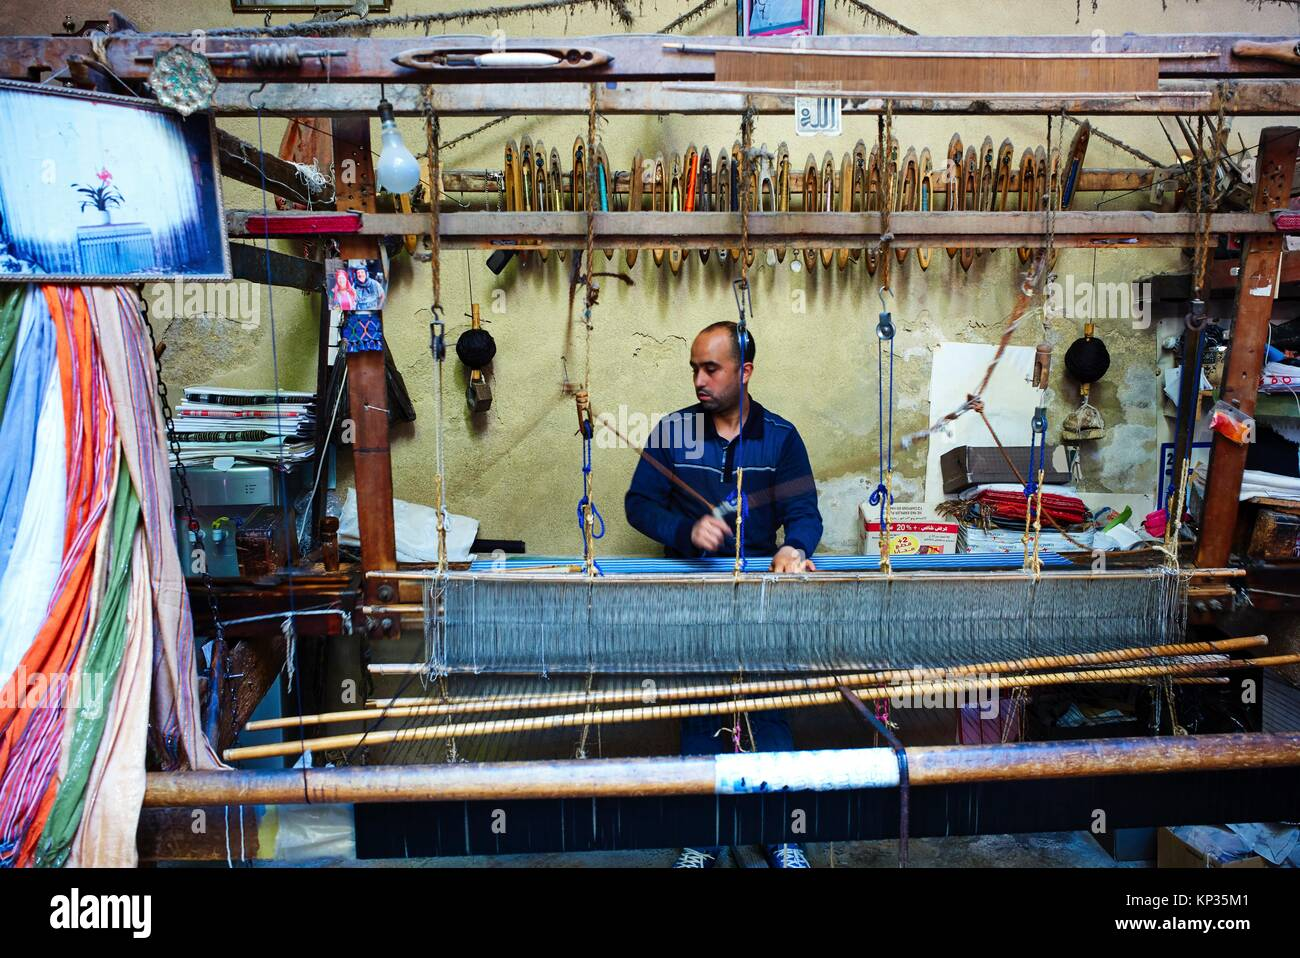 Weaving silk in the medina of Fez, Morocco - Stock Image